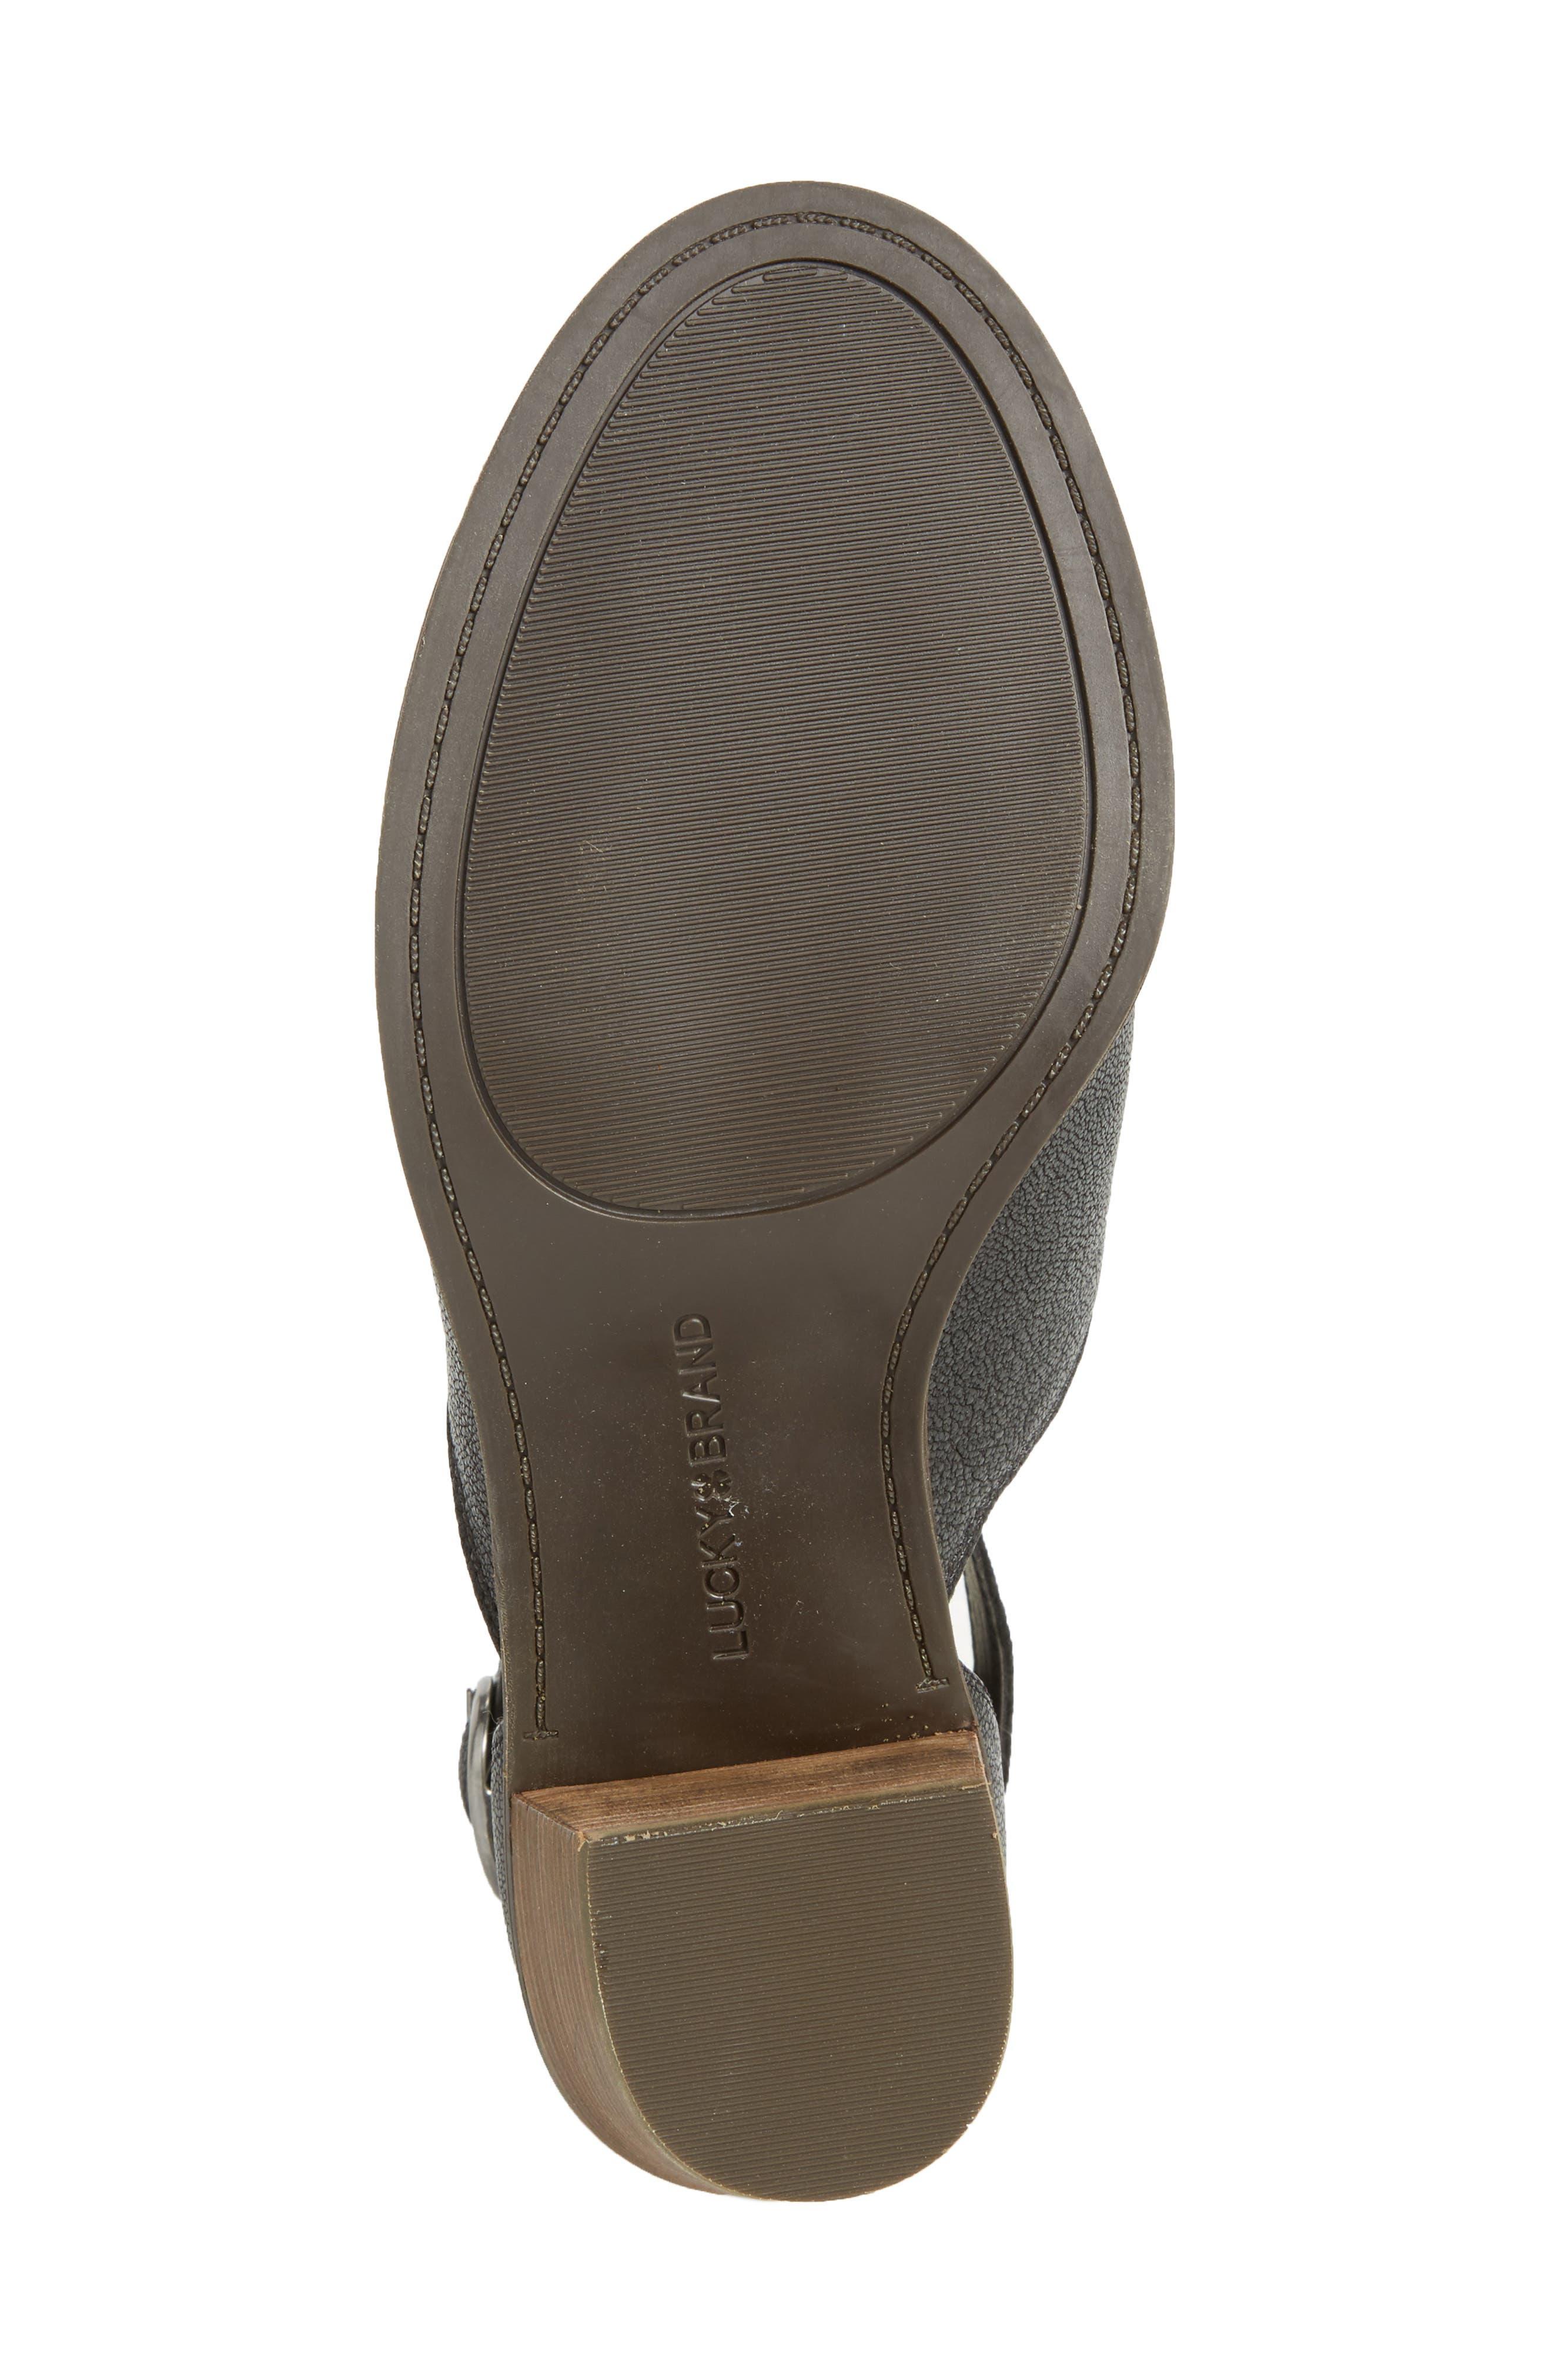 Kadian Block Heel Sandal,                             Alternate thumbnail 6, color,                             Black Leather